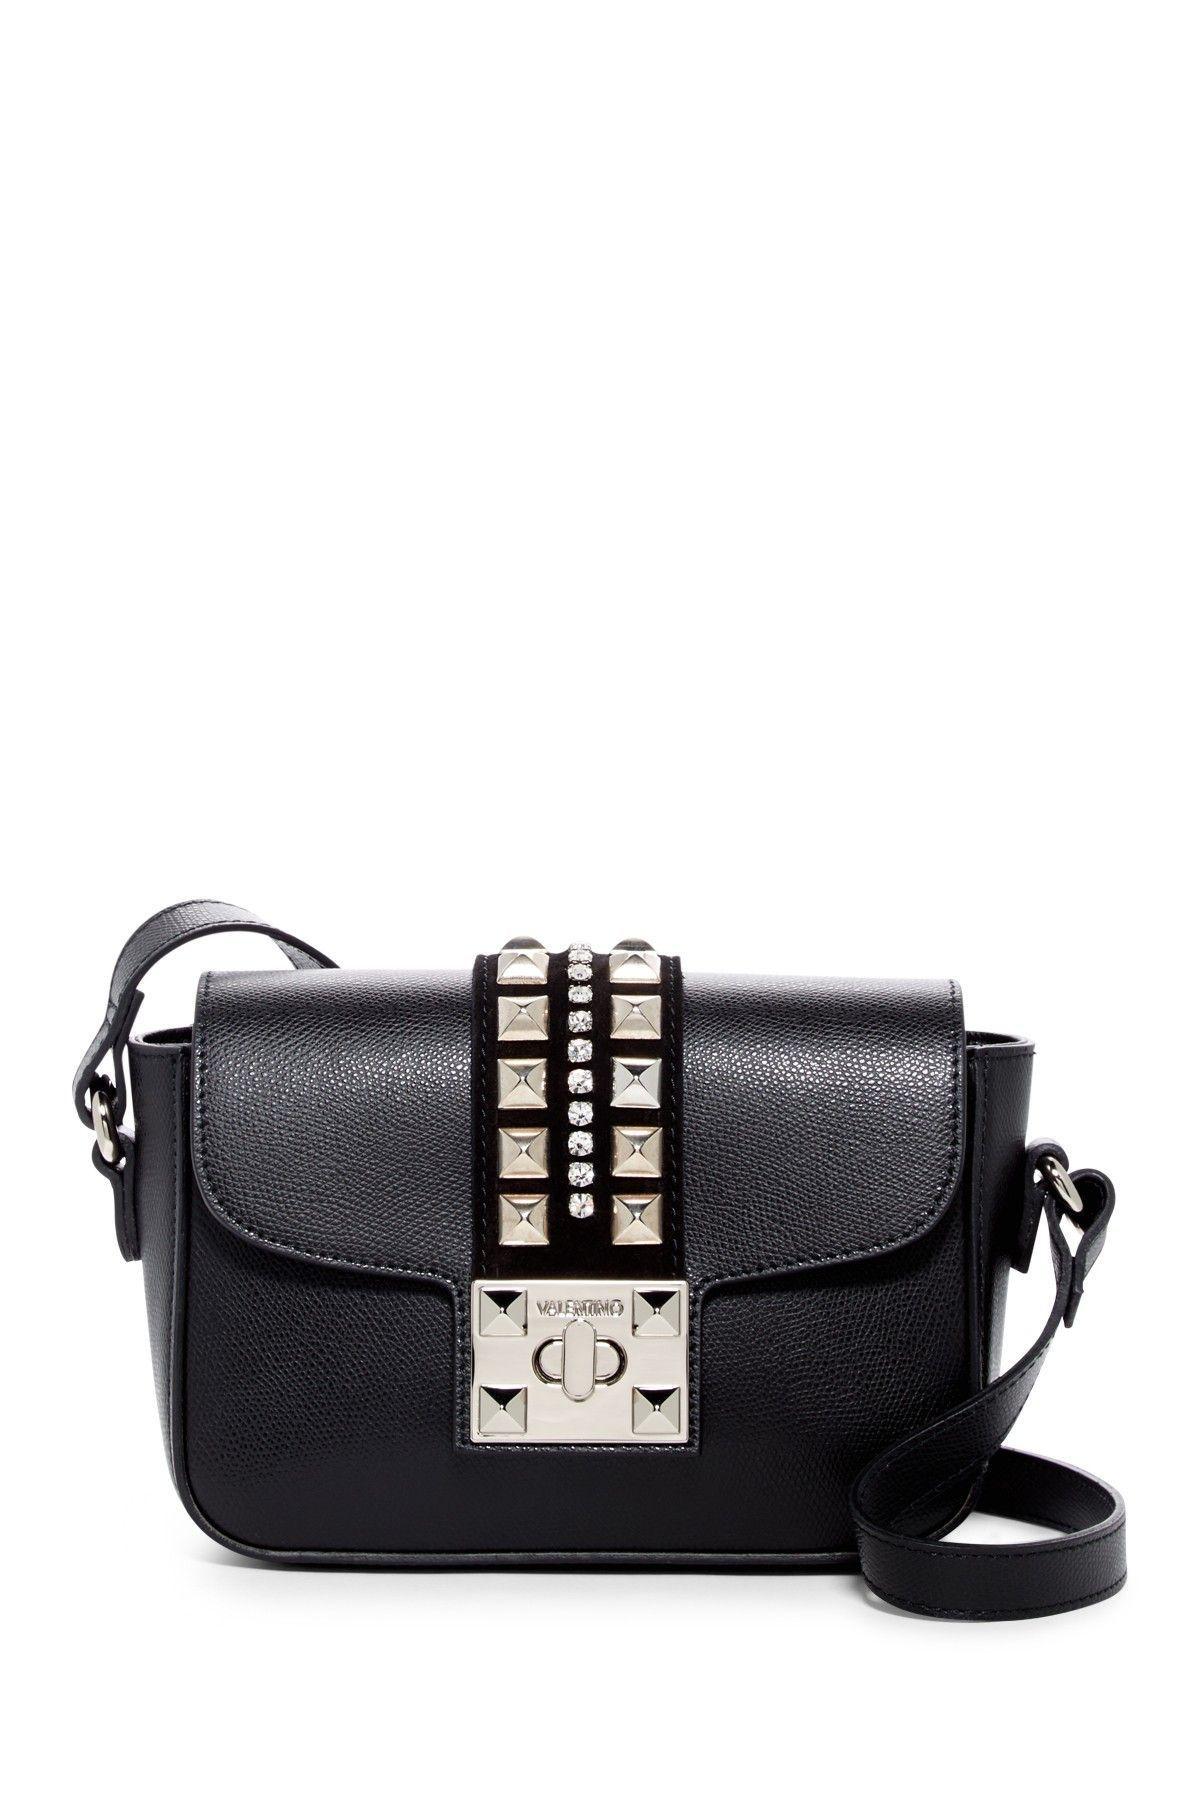 37fa11eb2d4d Valentino By Mario Valentino Yasmine PLMLTO Black Leather Crossbody Bag  #leathercrossbodybag